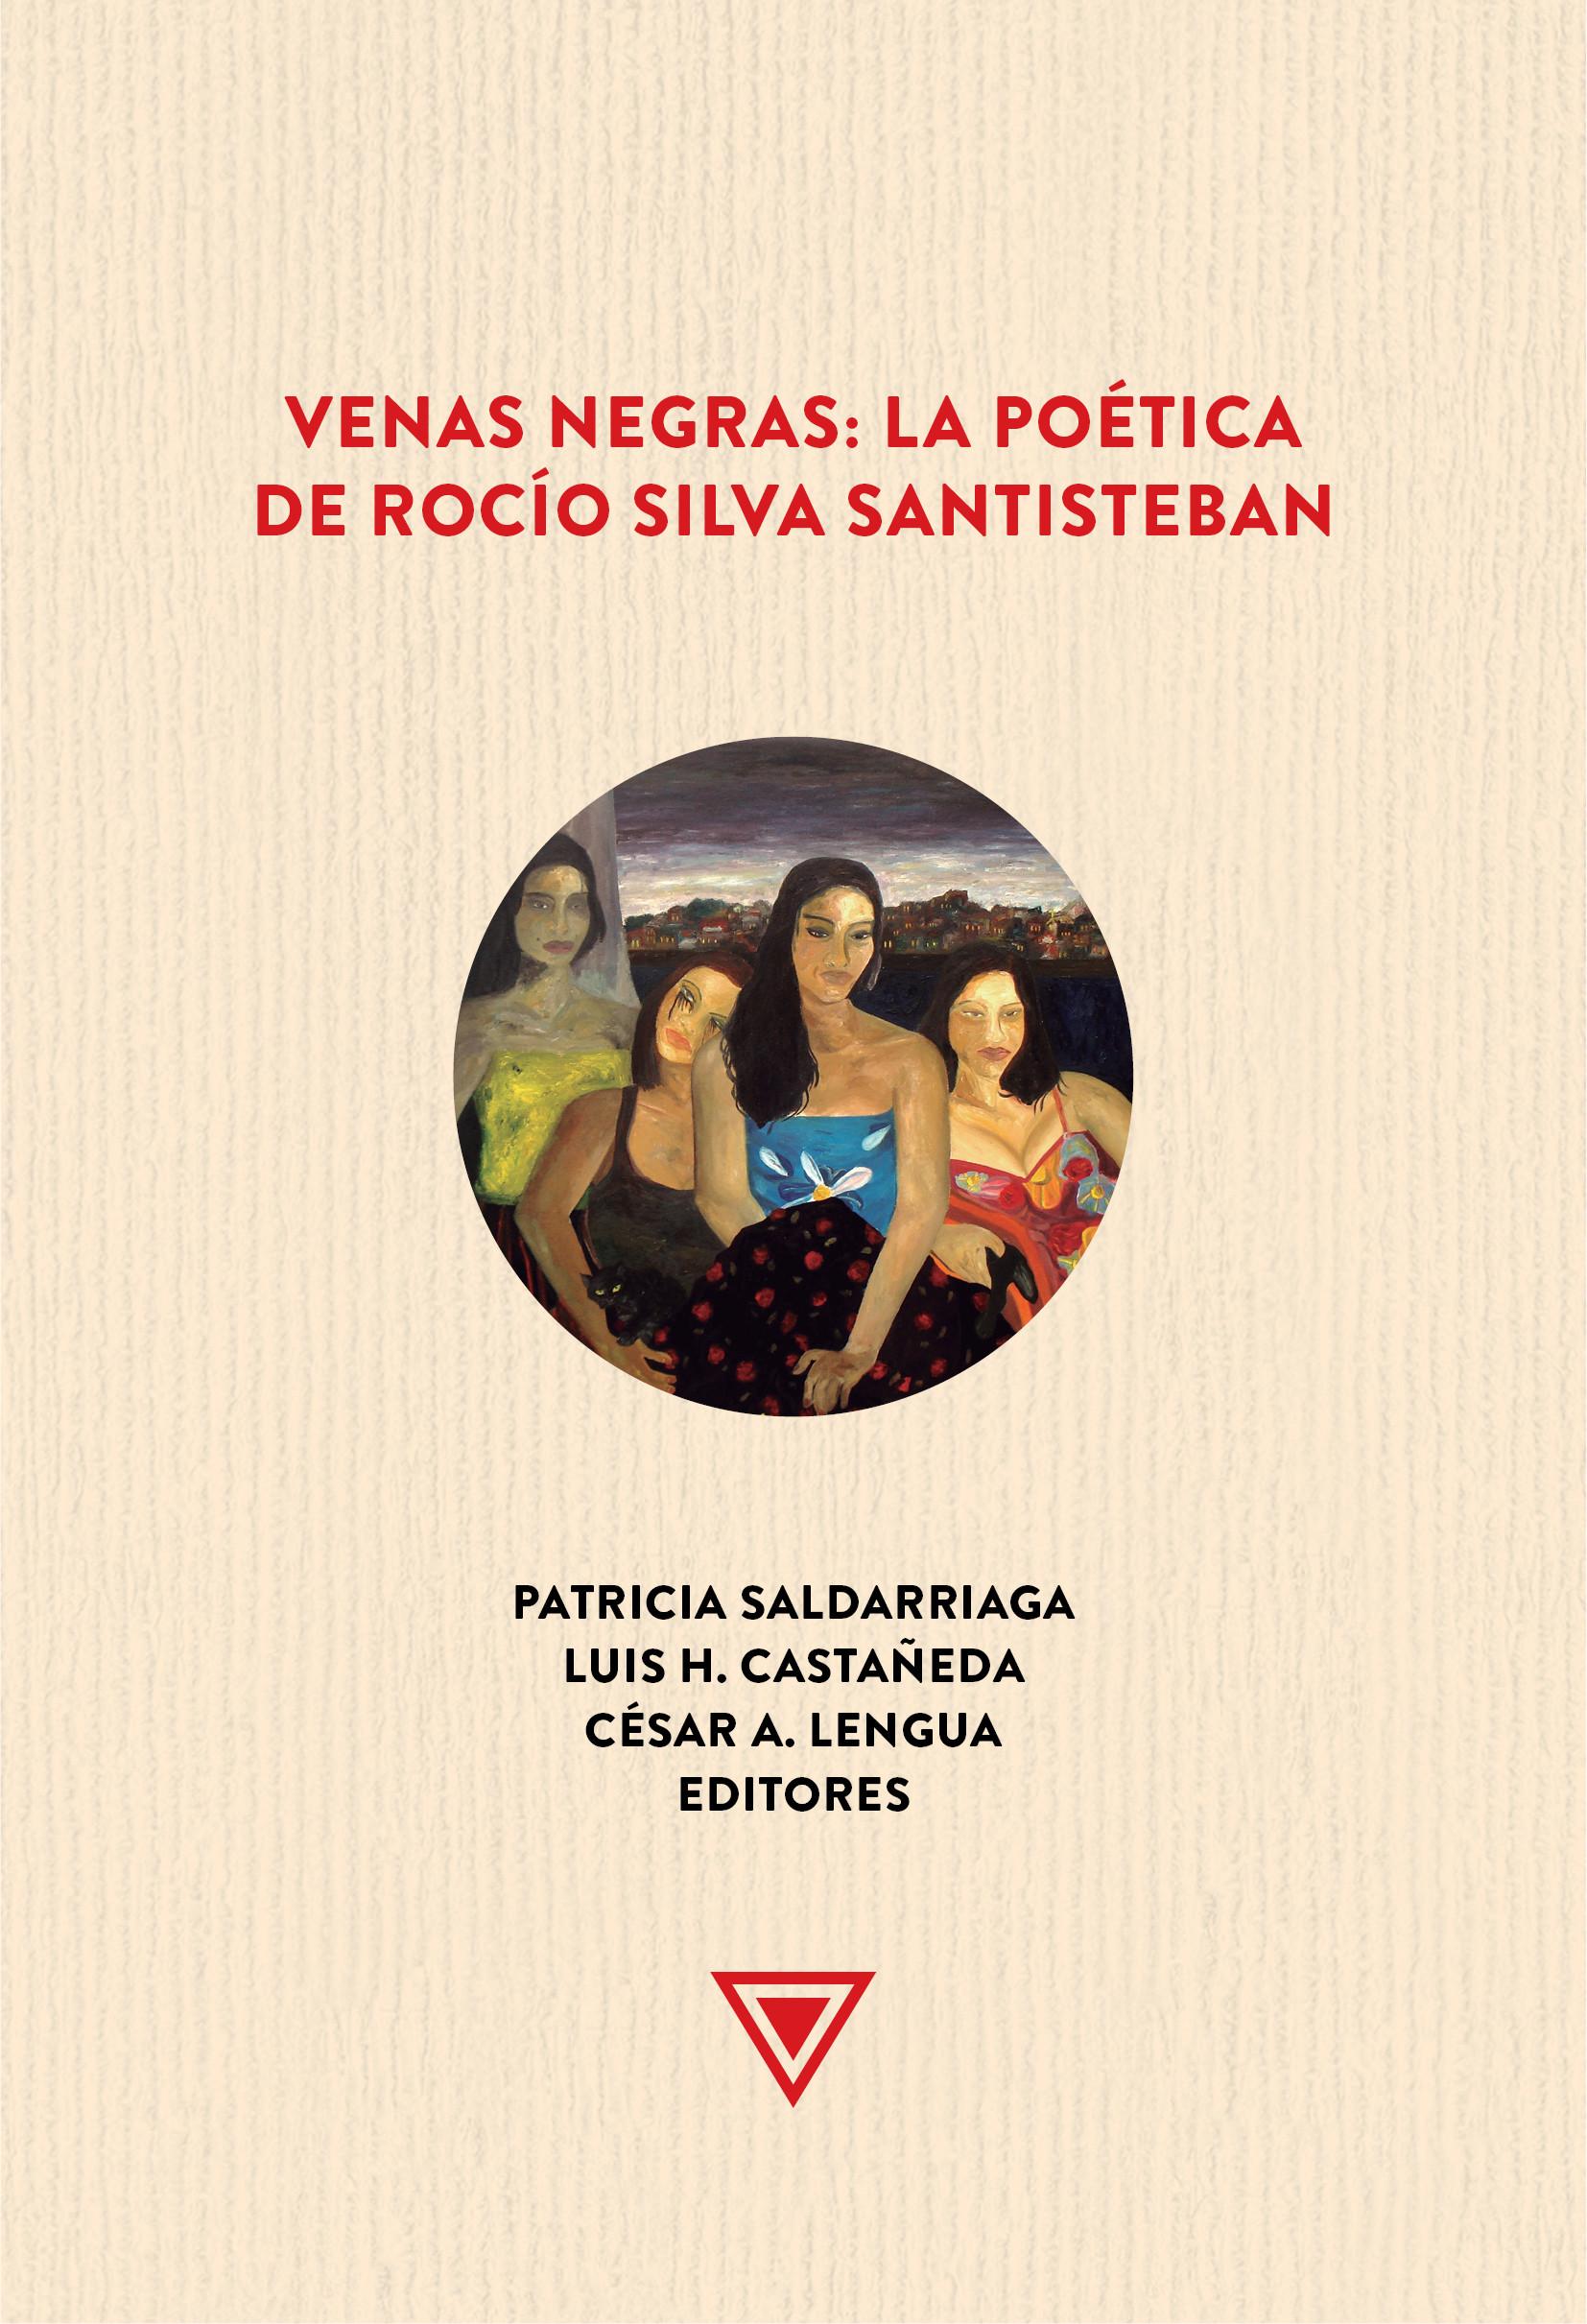 Venas negras. La poética de Rocío Silva Santisteban